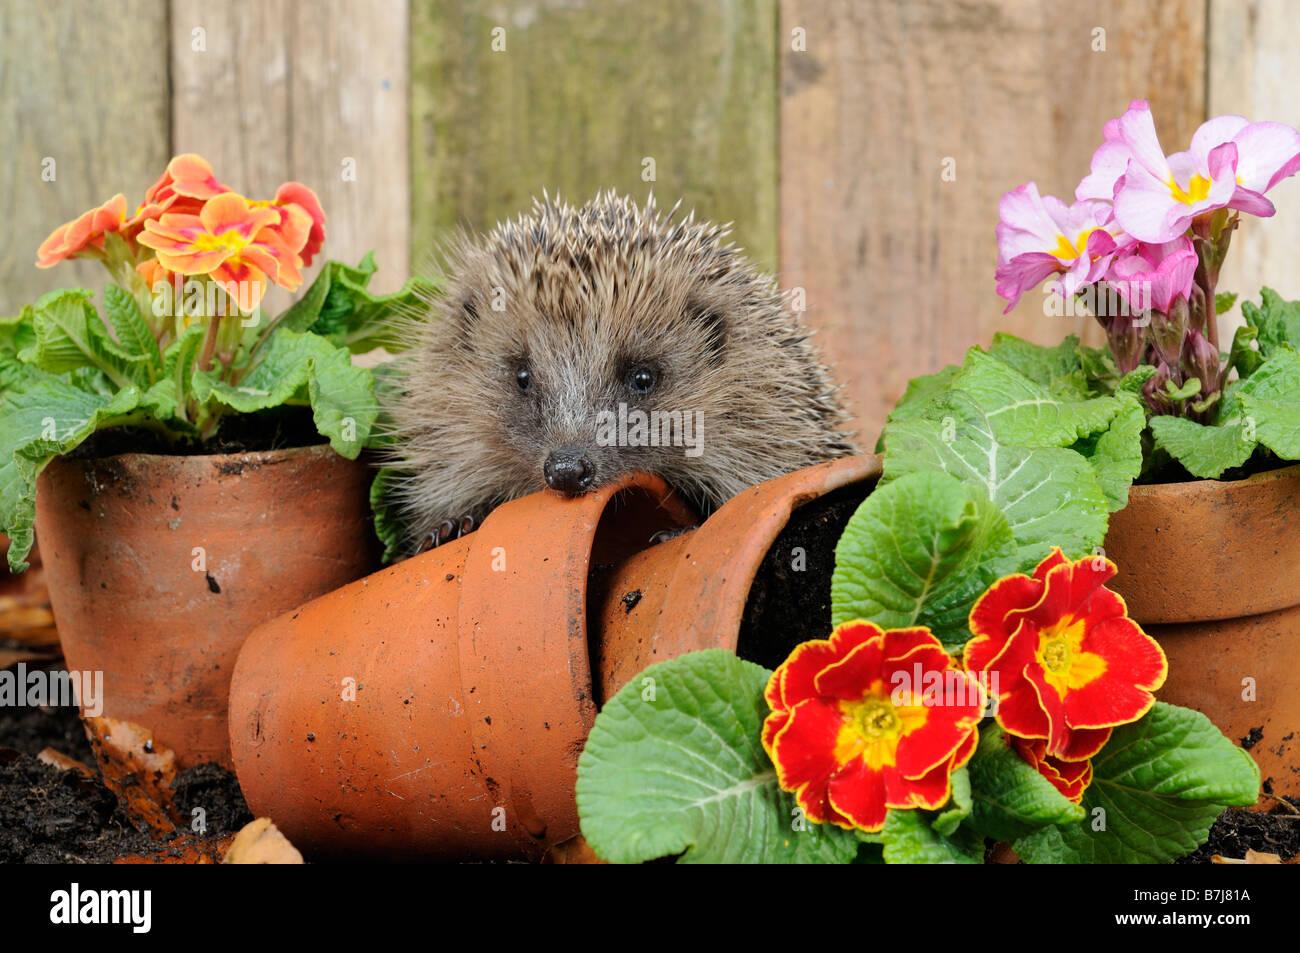 European Hedgehog erinaceus europaeus exploring amongst primroses and terracotta flowerpots - Stock Image